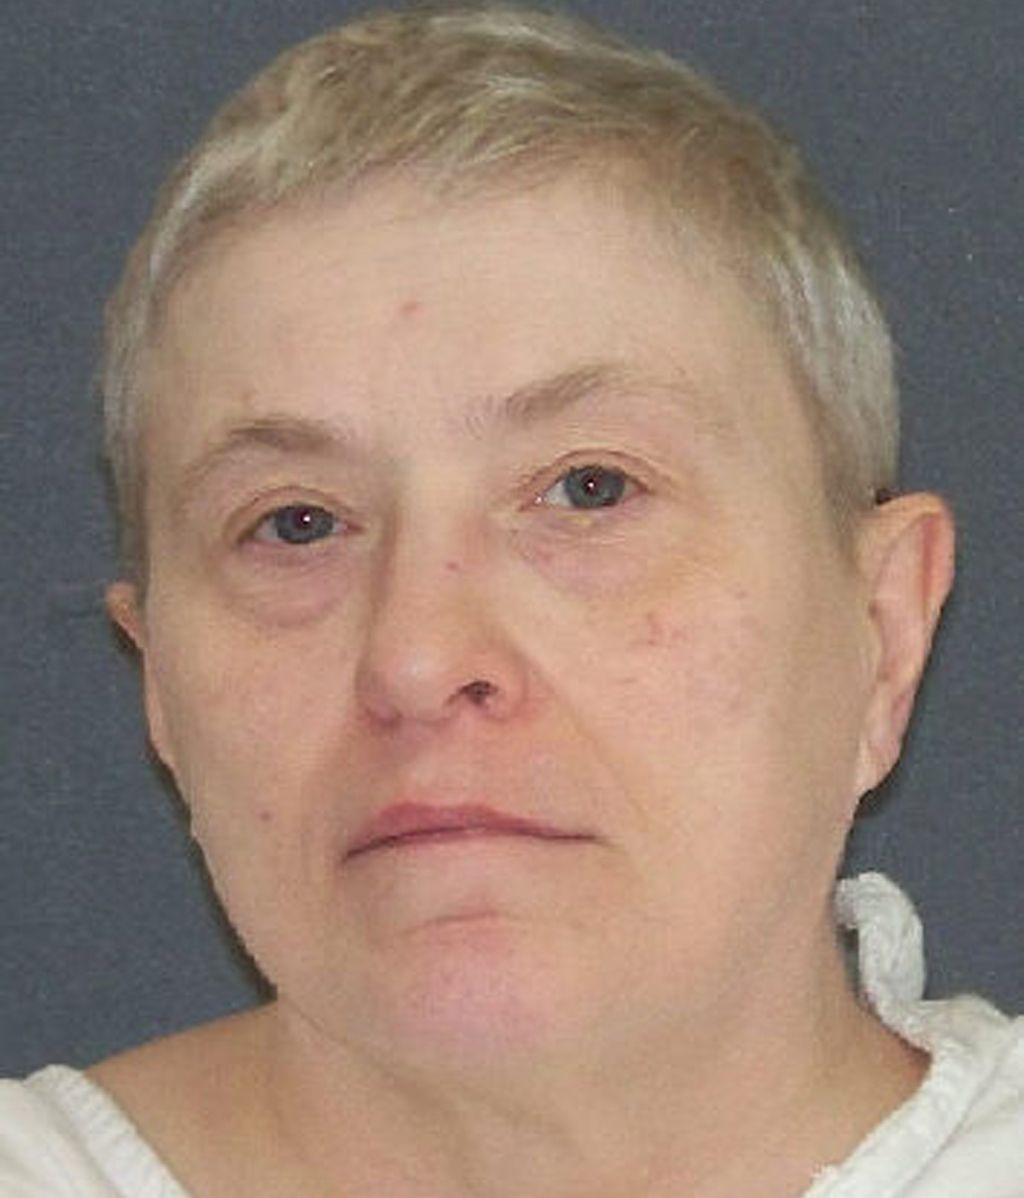 Suzanne Margaret Basso, ejecutada en Texas